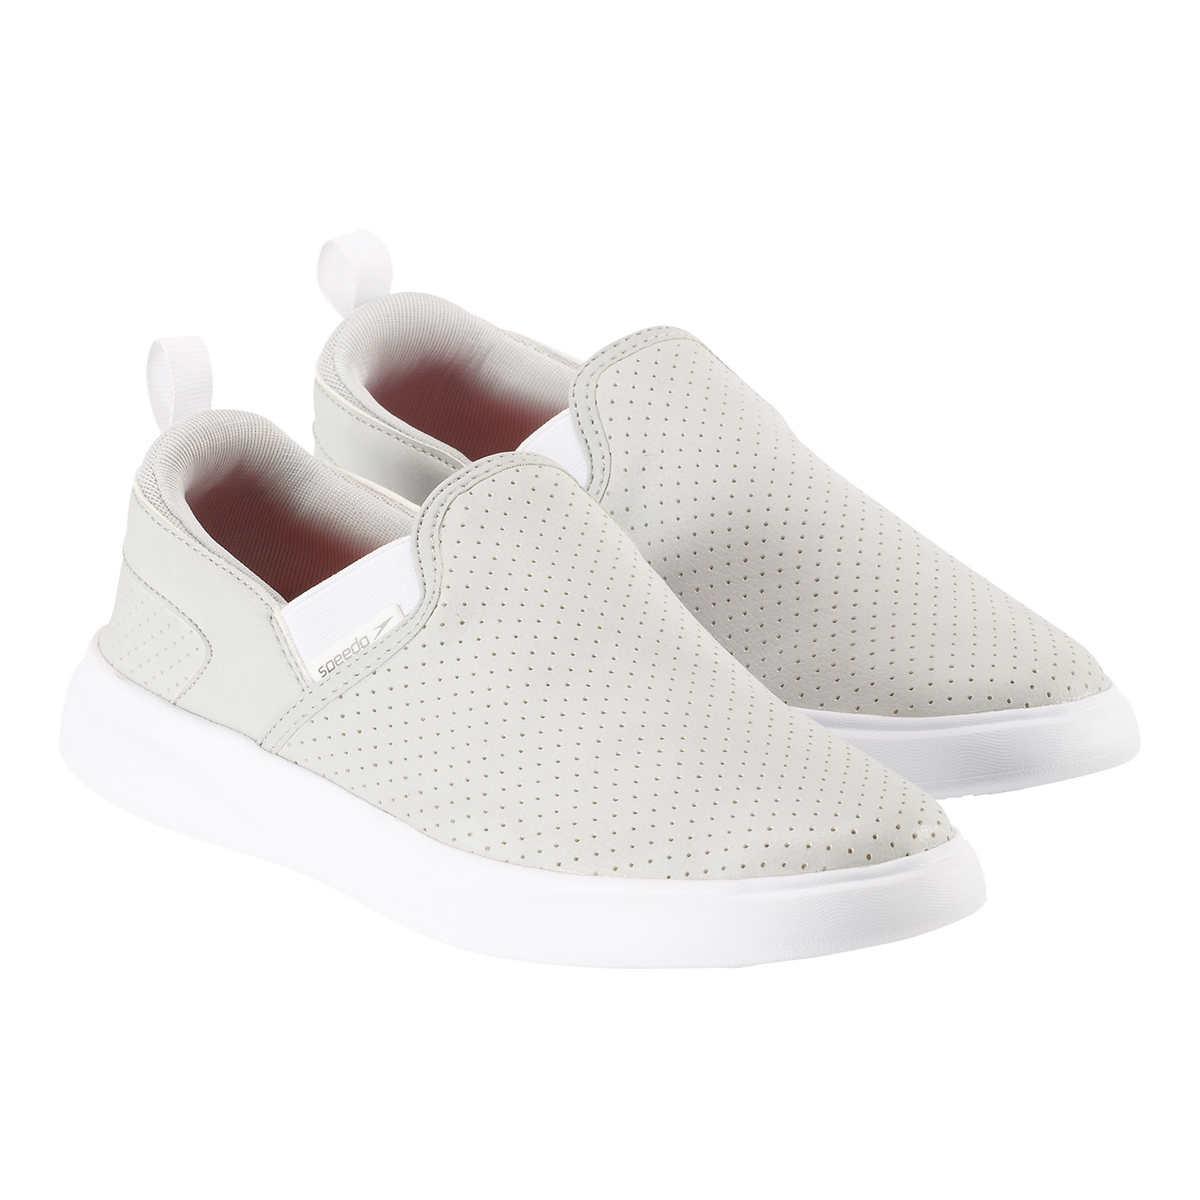 Costco Speedo ladies hybrid shoes $2.50 YMMV